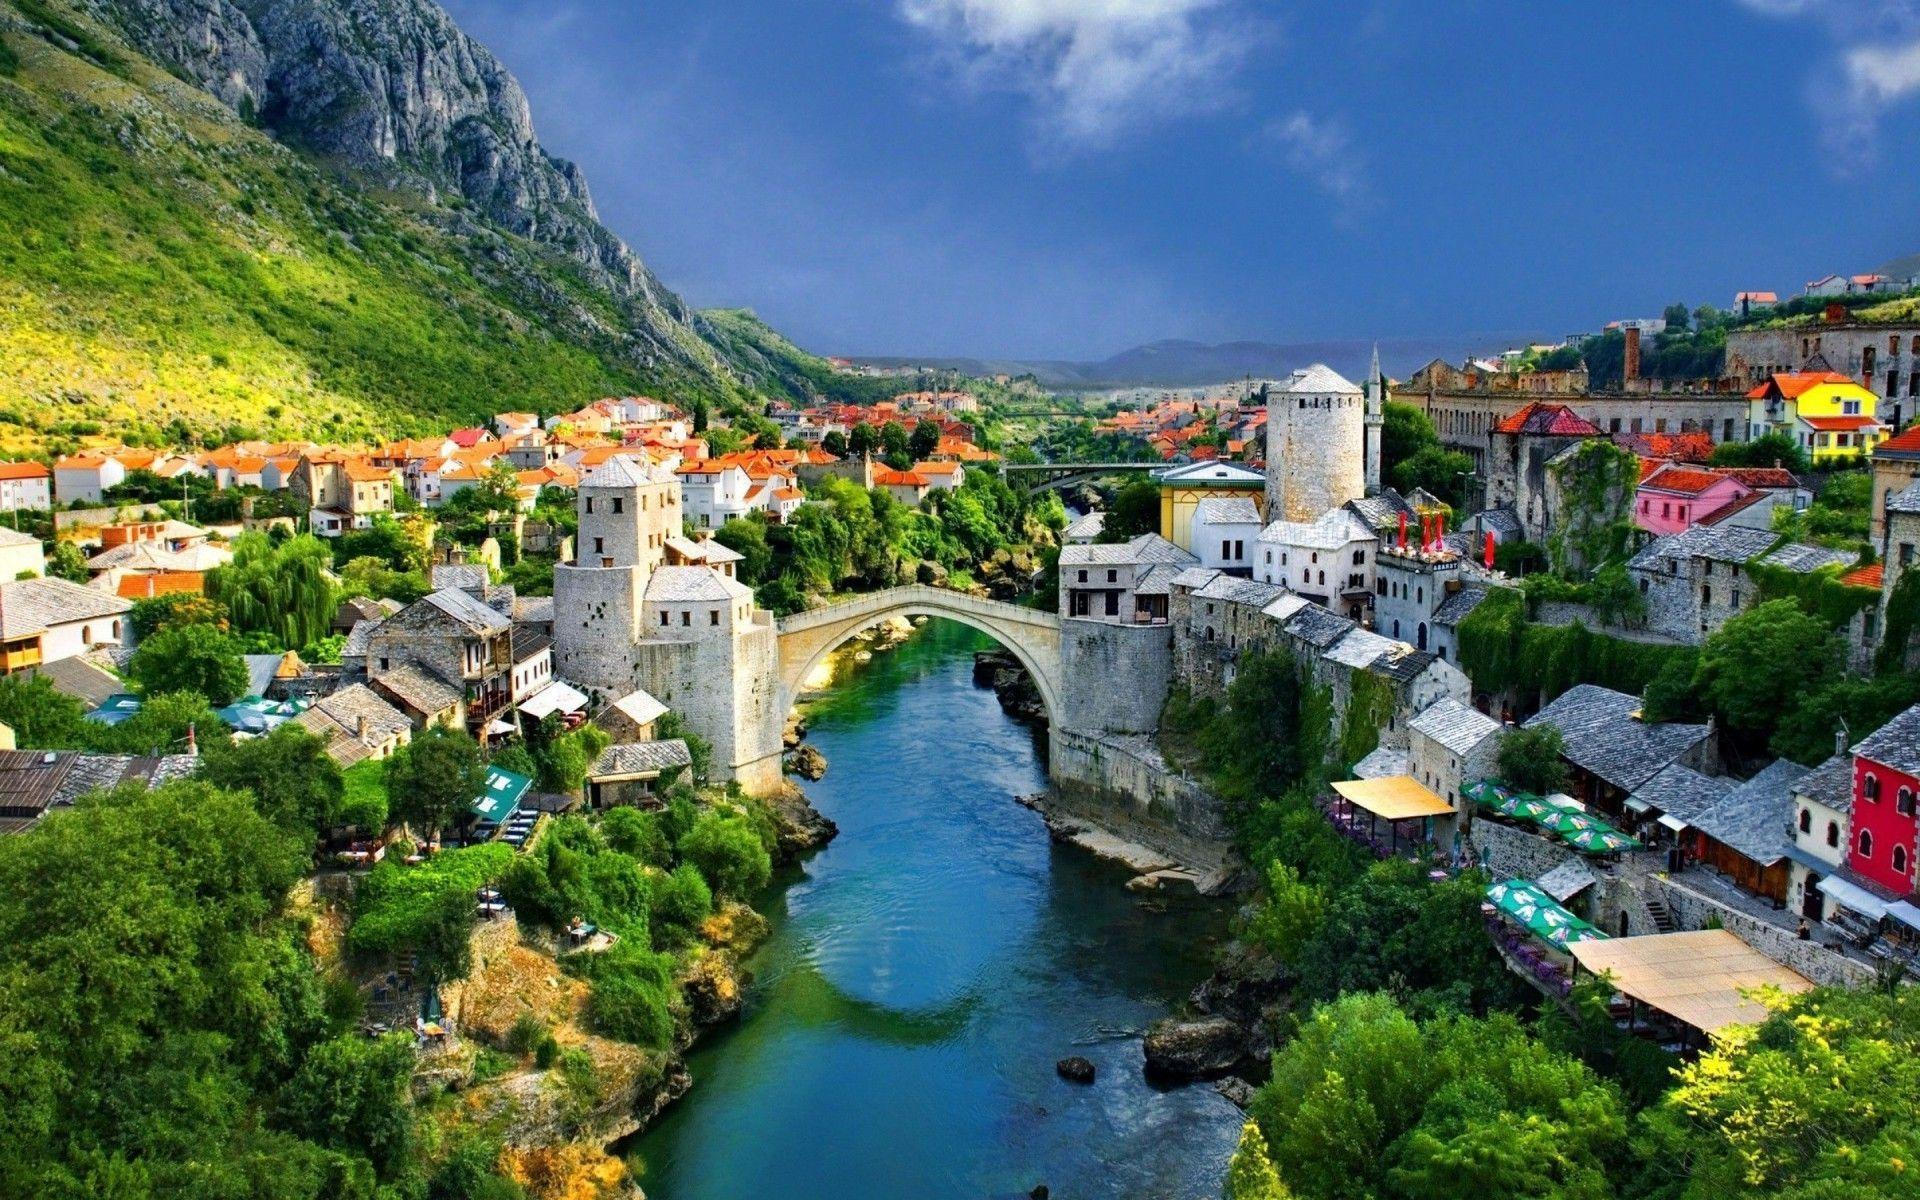 Mostar Bridge Wallpapers - Top Free Mostar Bridge ...